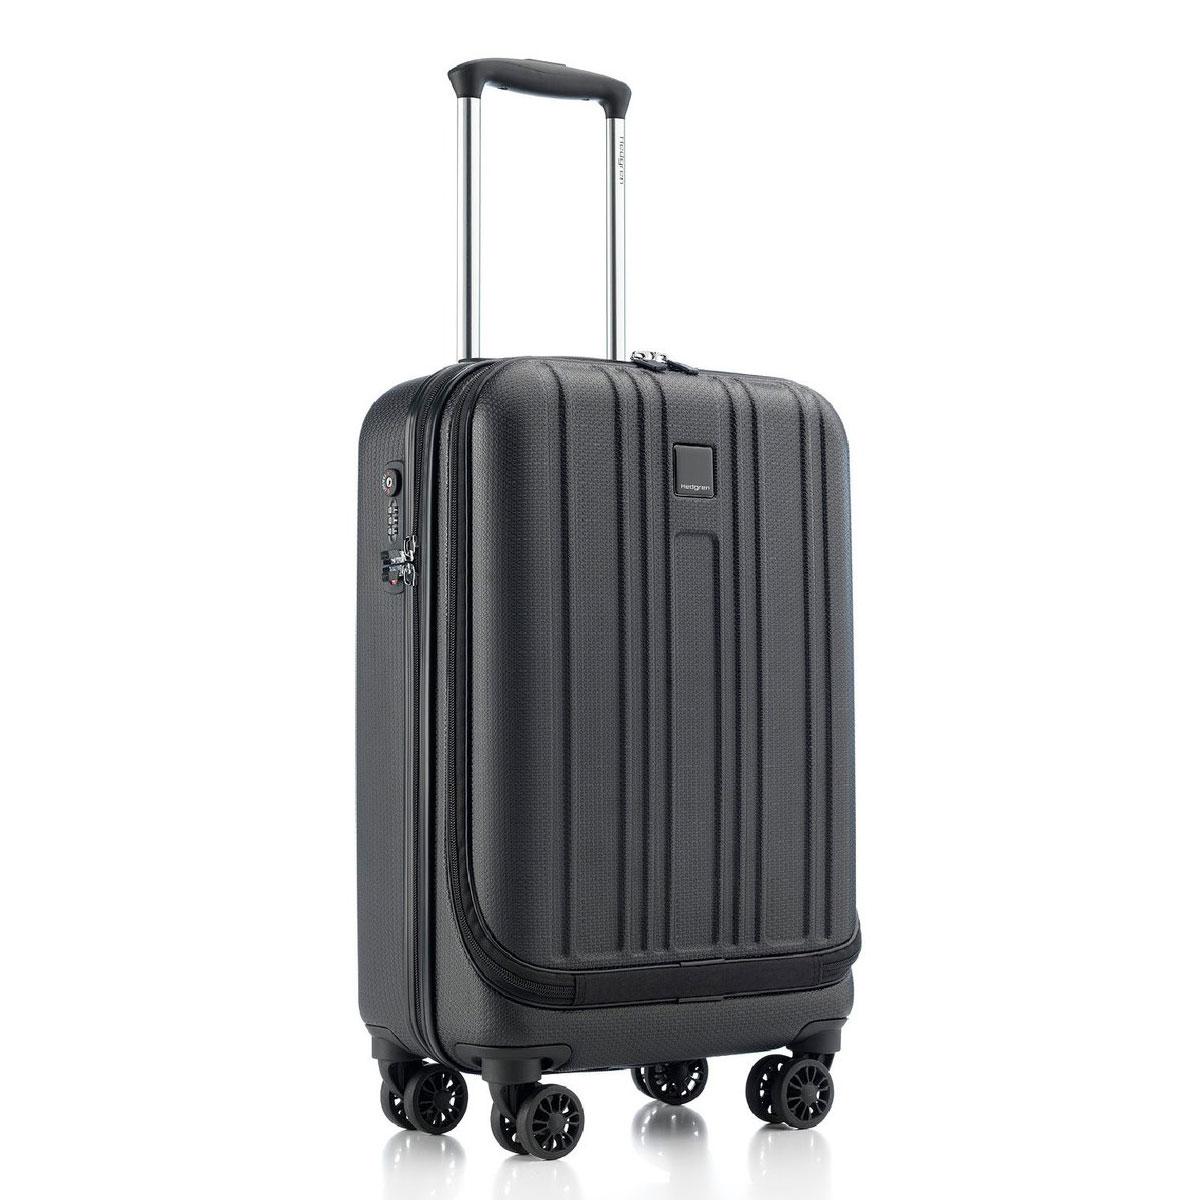 Hedgren transit boarding s noir sac sacoche housse for Valise makita avec tous ses accessoires